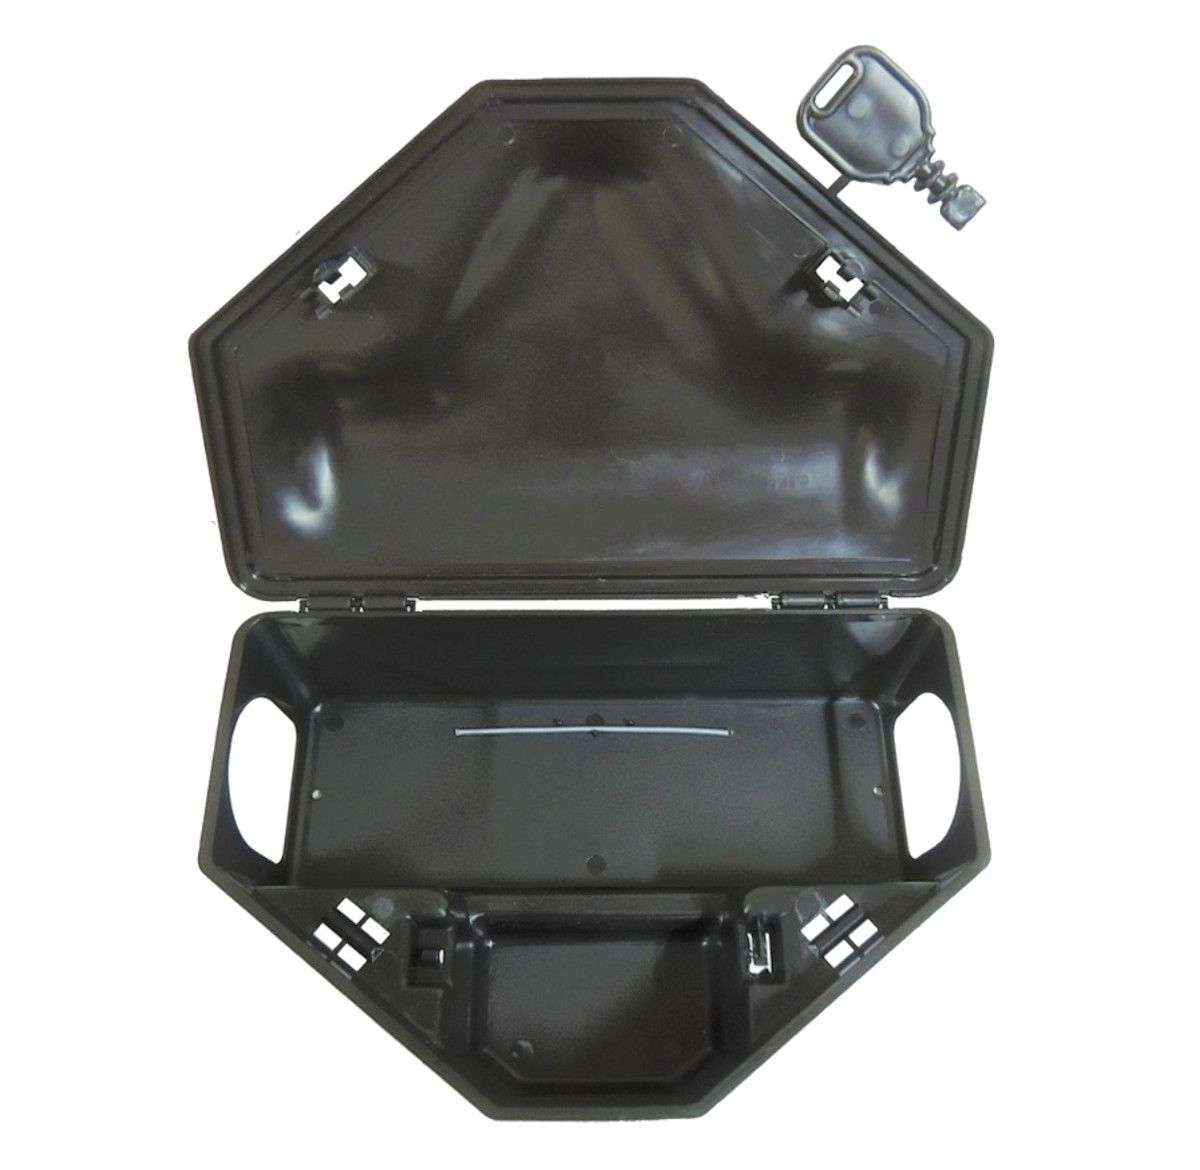 Kit 43 Porta Isca Com 2 Chaves - Duplo Travamento